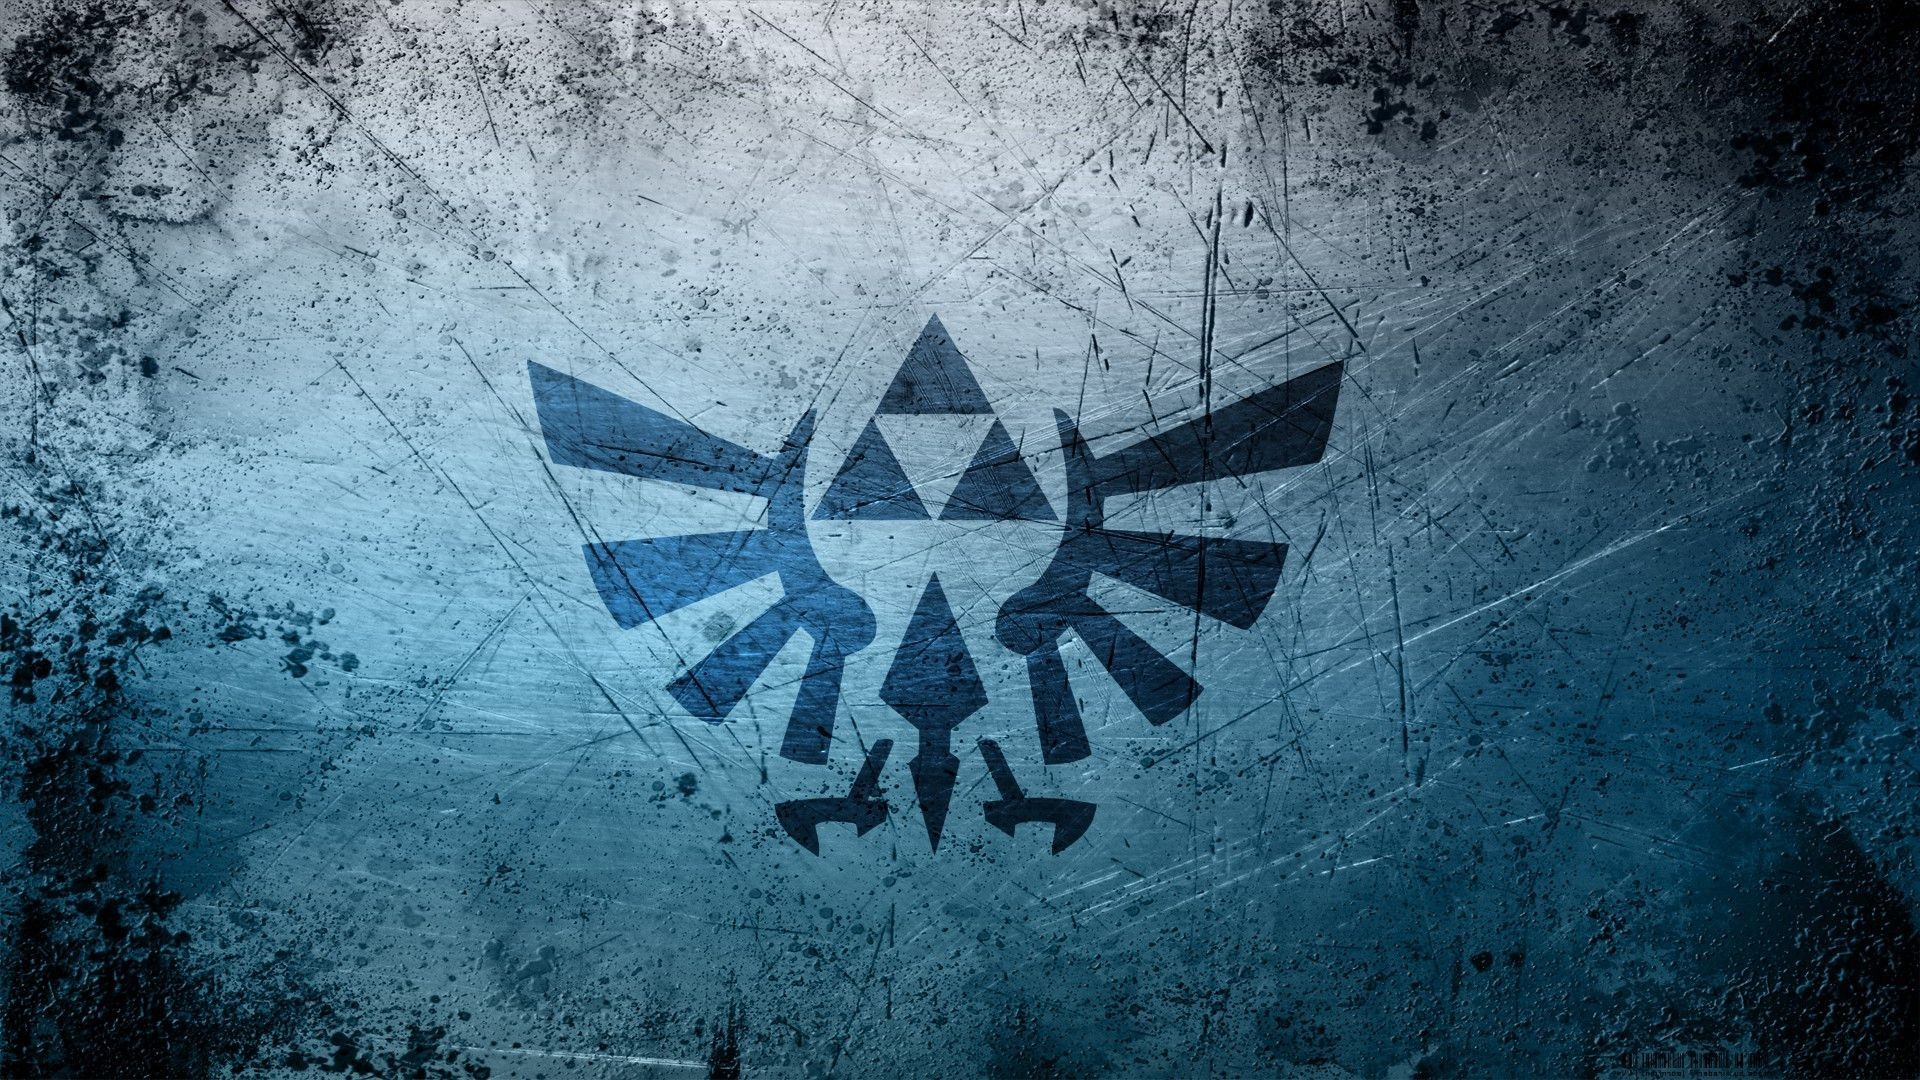 triforce-the-legend-of-zelda-game-hd-wallpaper-